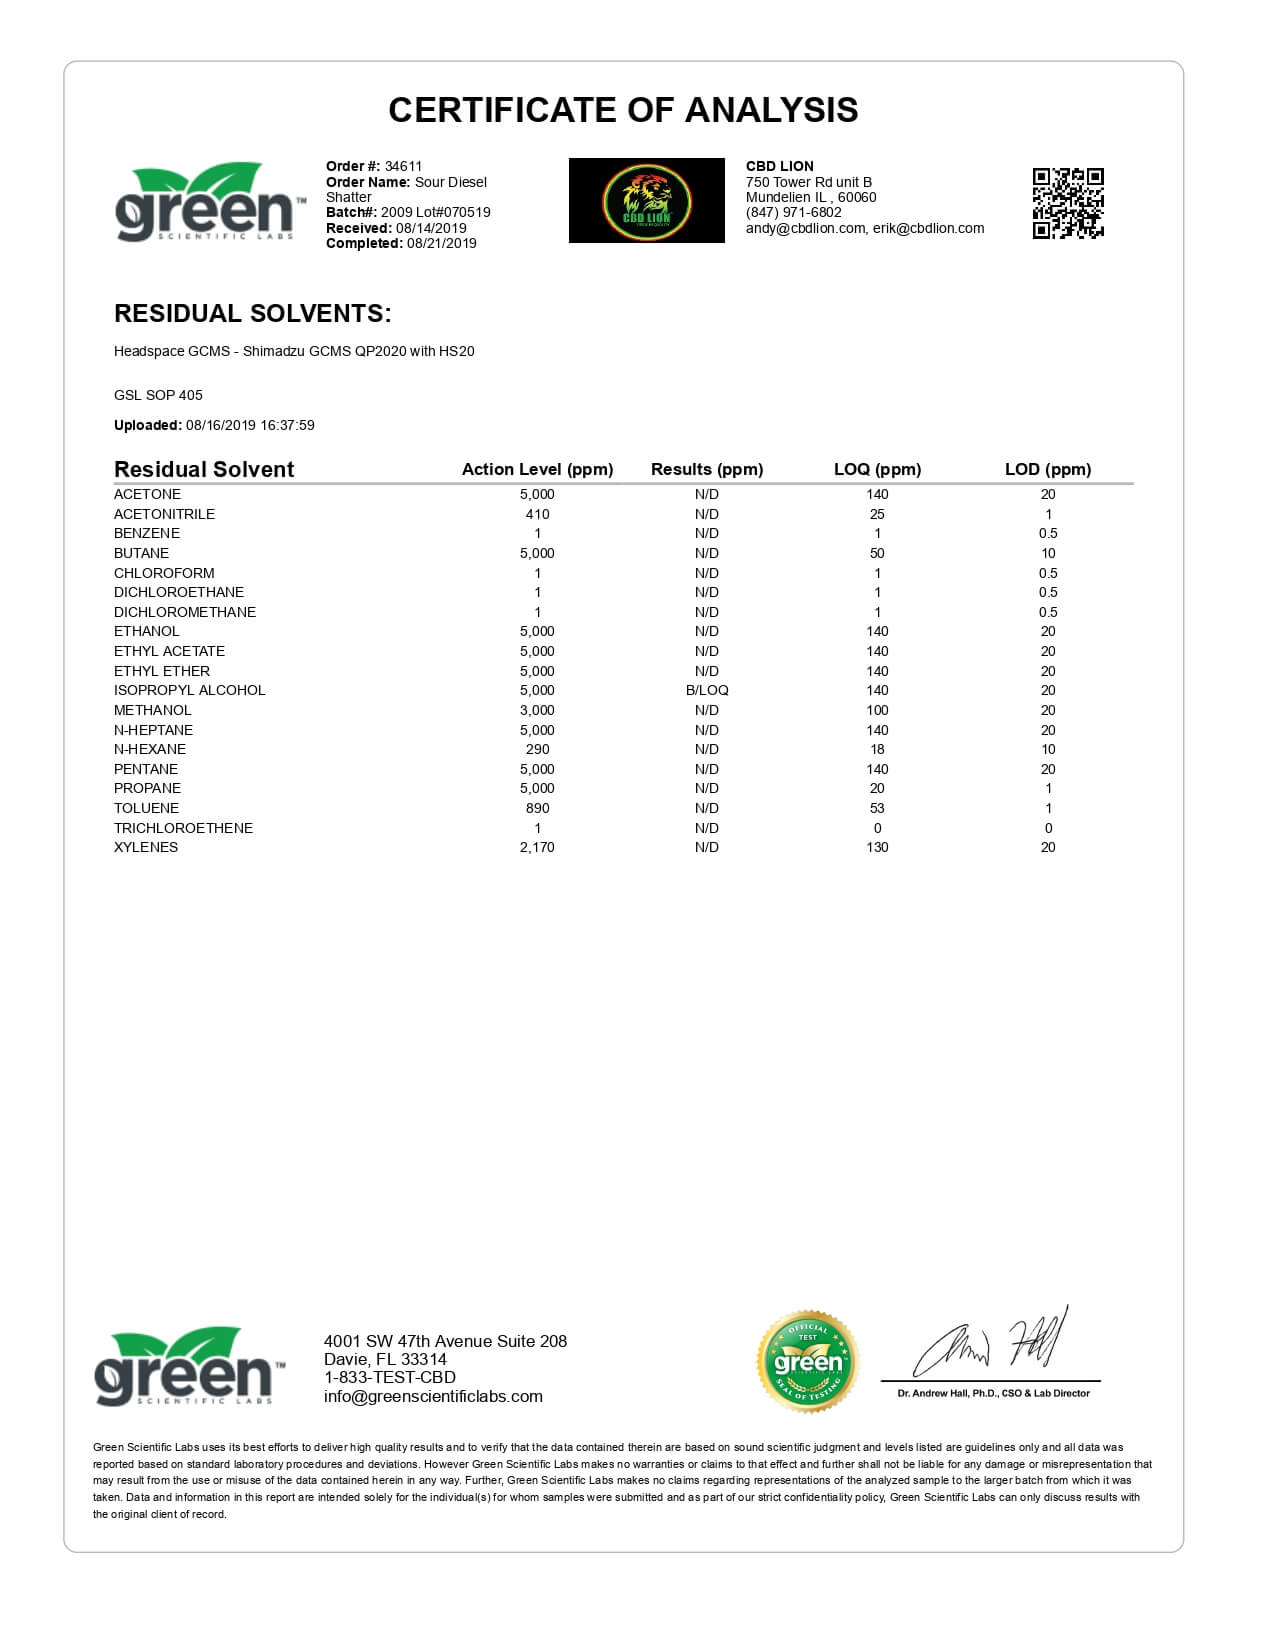 CBD Lion CBD Concentrate Sour Diesel Shatter 0.5g Lab Report